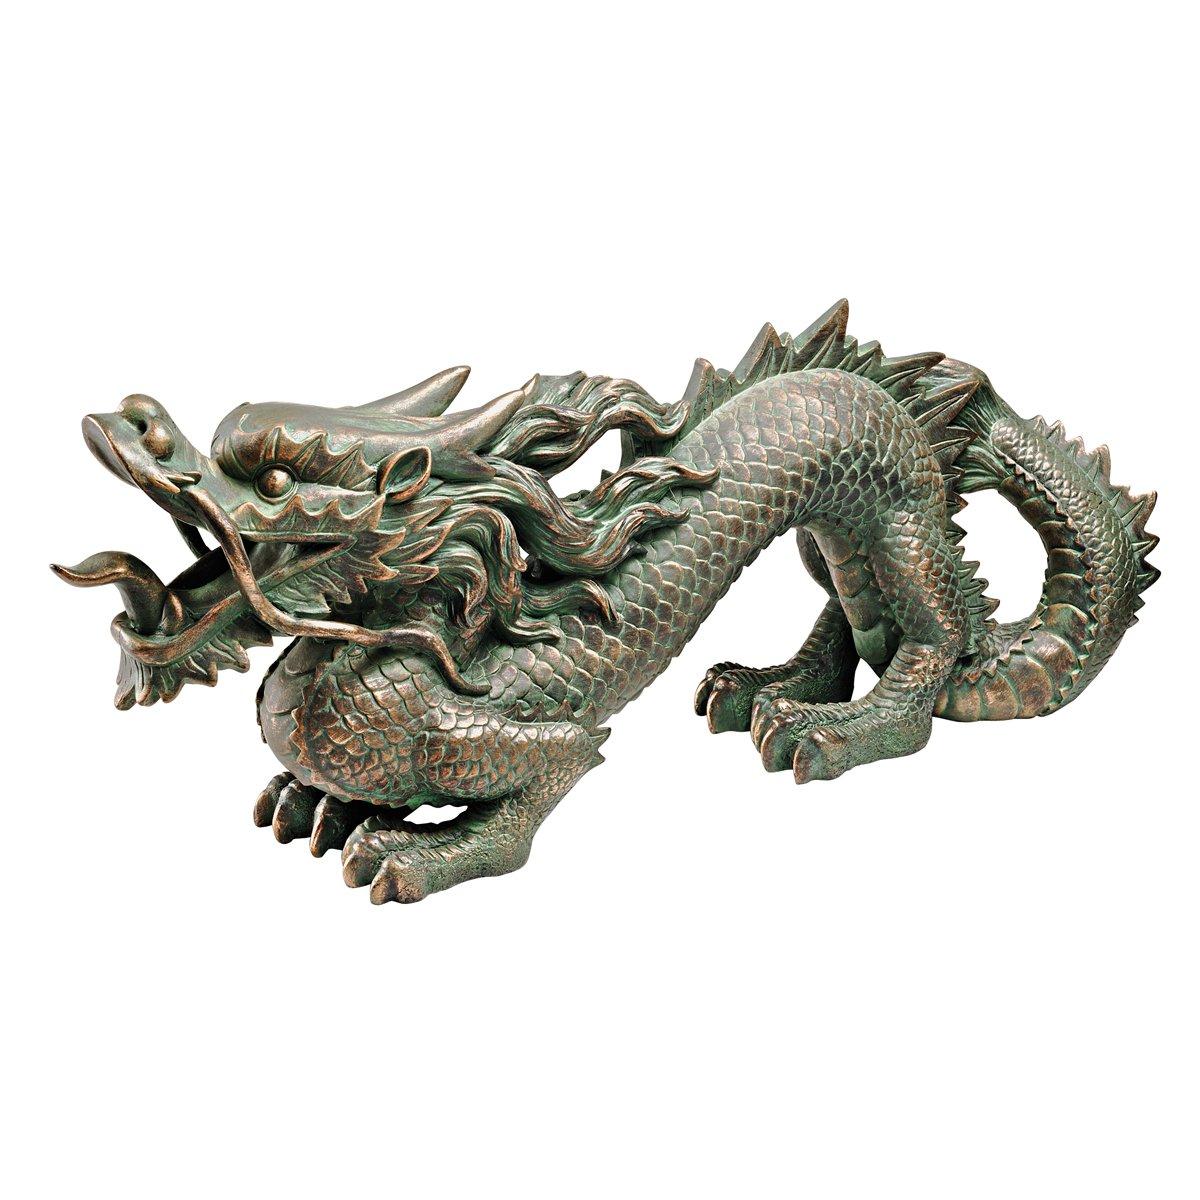 Design Toscano EU9306 Asian Dragon of the Great Wall Statue - green